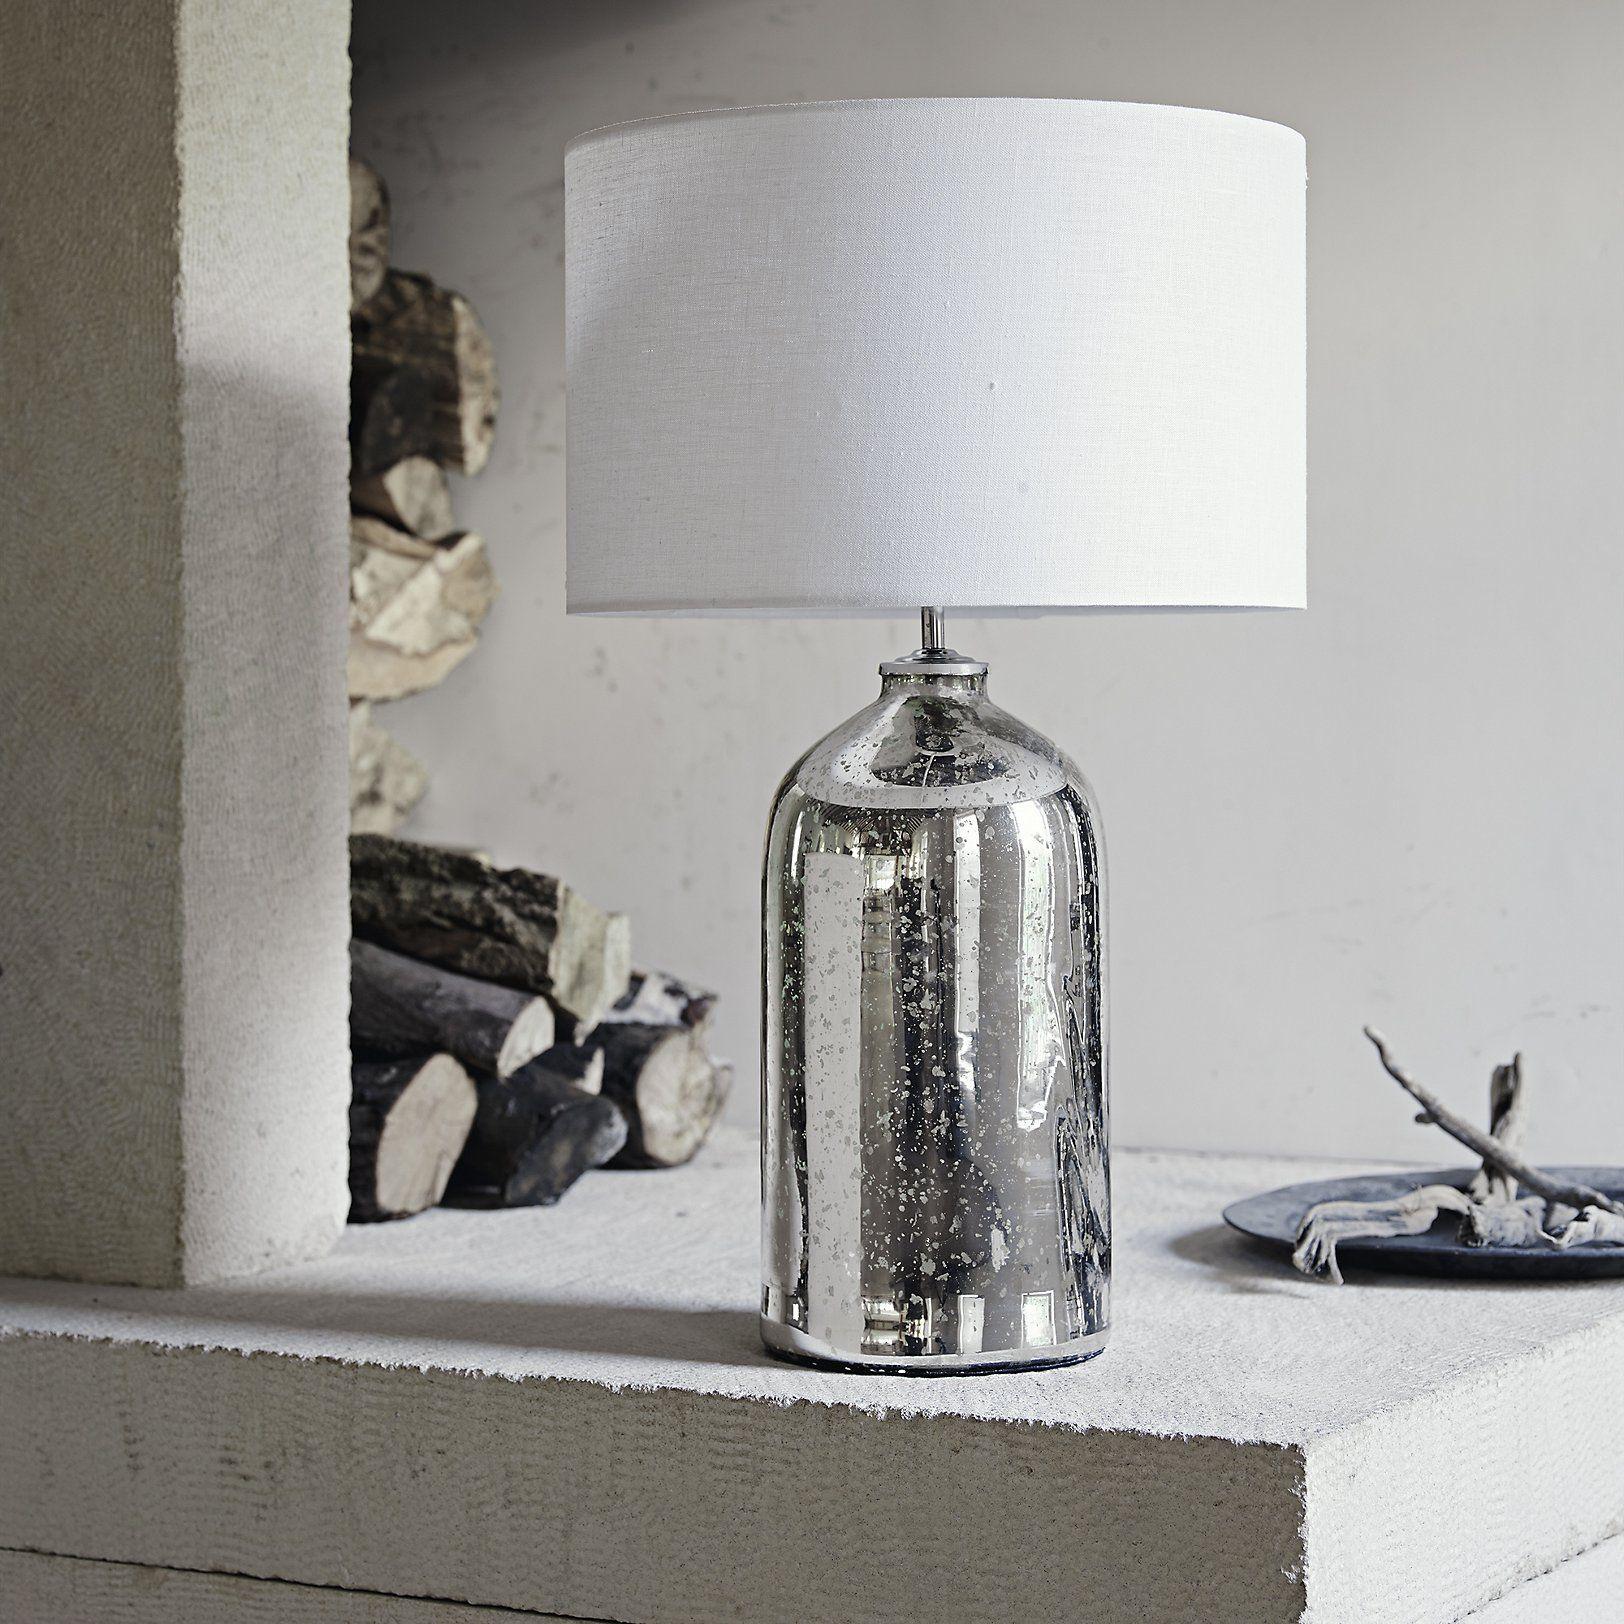 Mercury Large Bottle Table Lamp Table Lamps The White Company Bottle Table Lamps Table Lamp Lamp